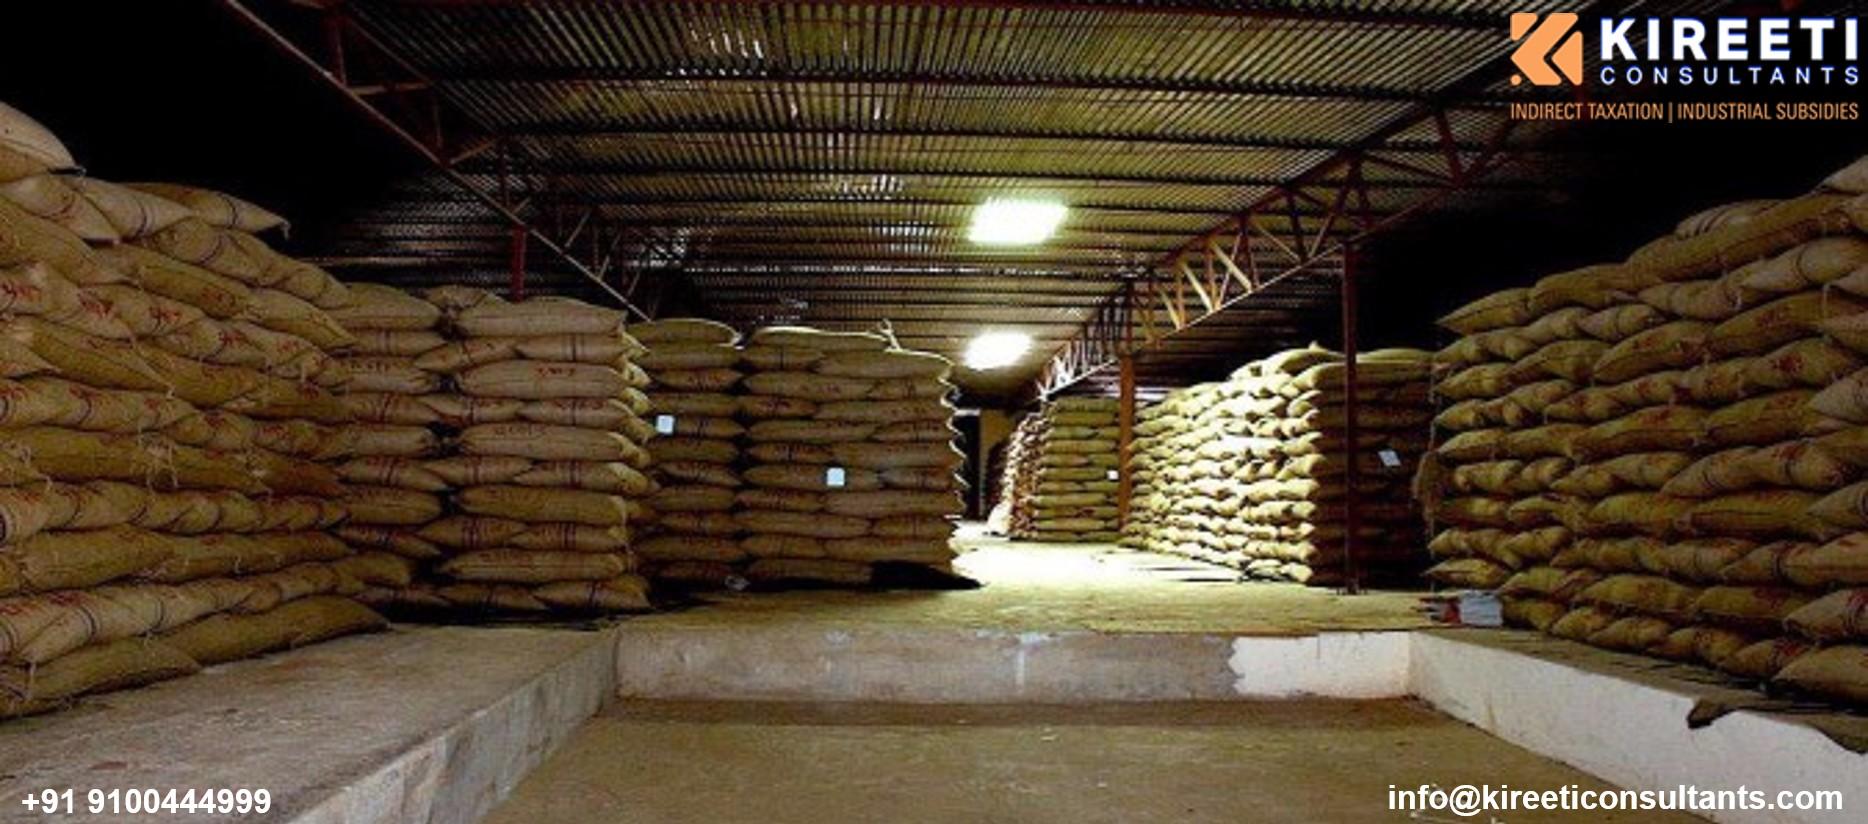 Rural godown / warehouse subsidy scheme